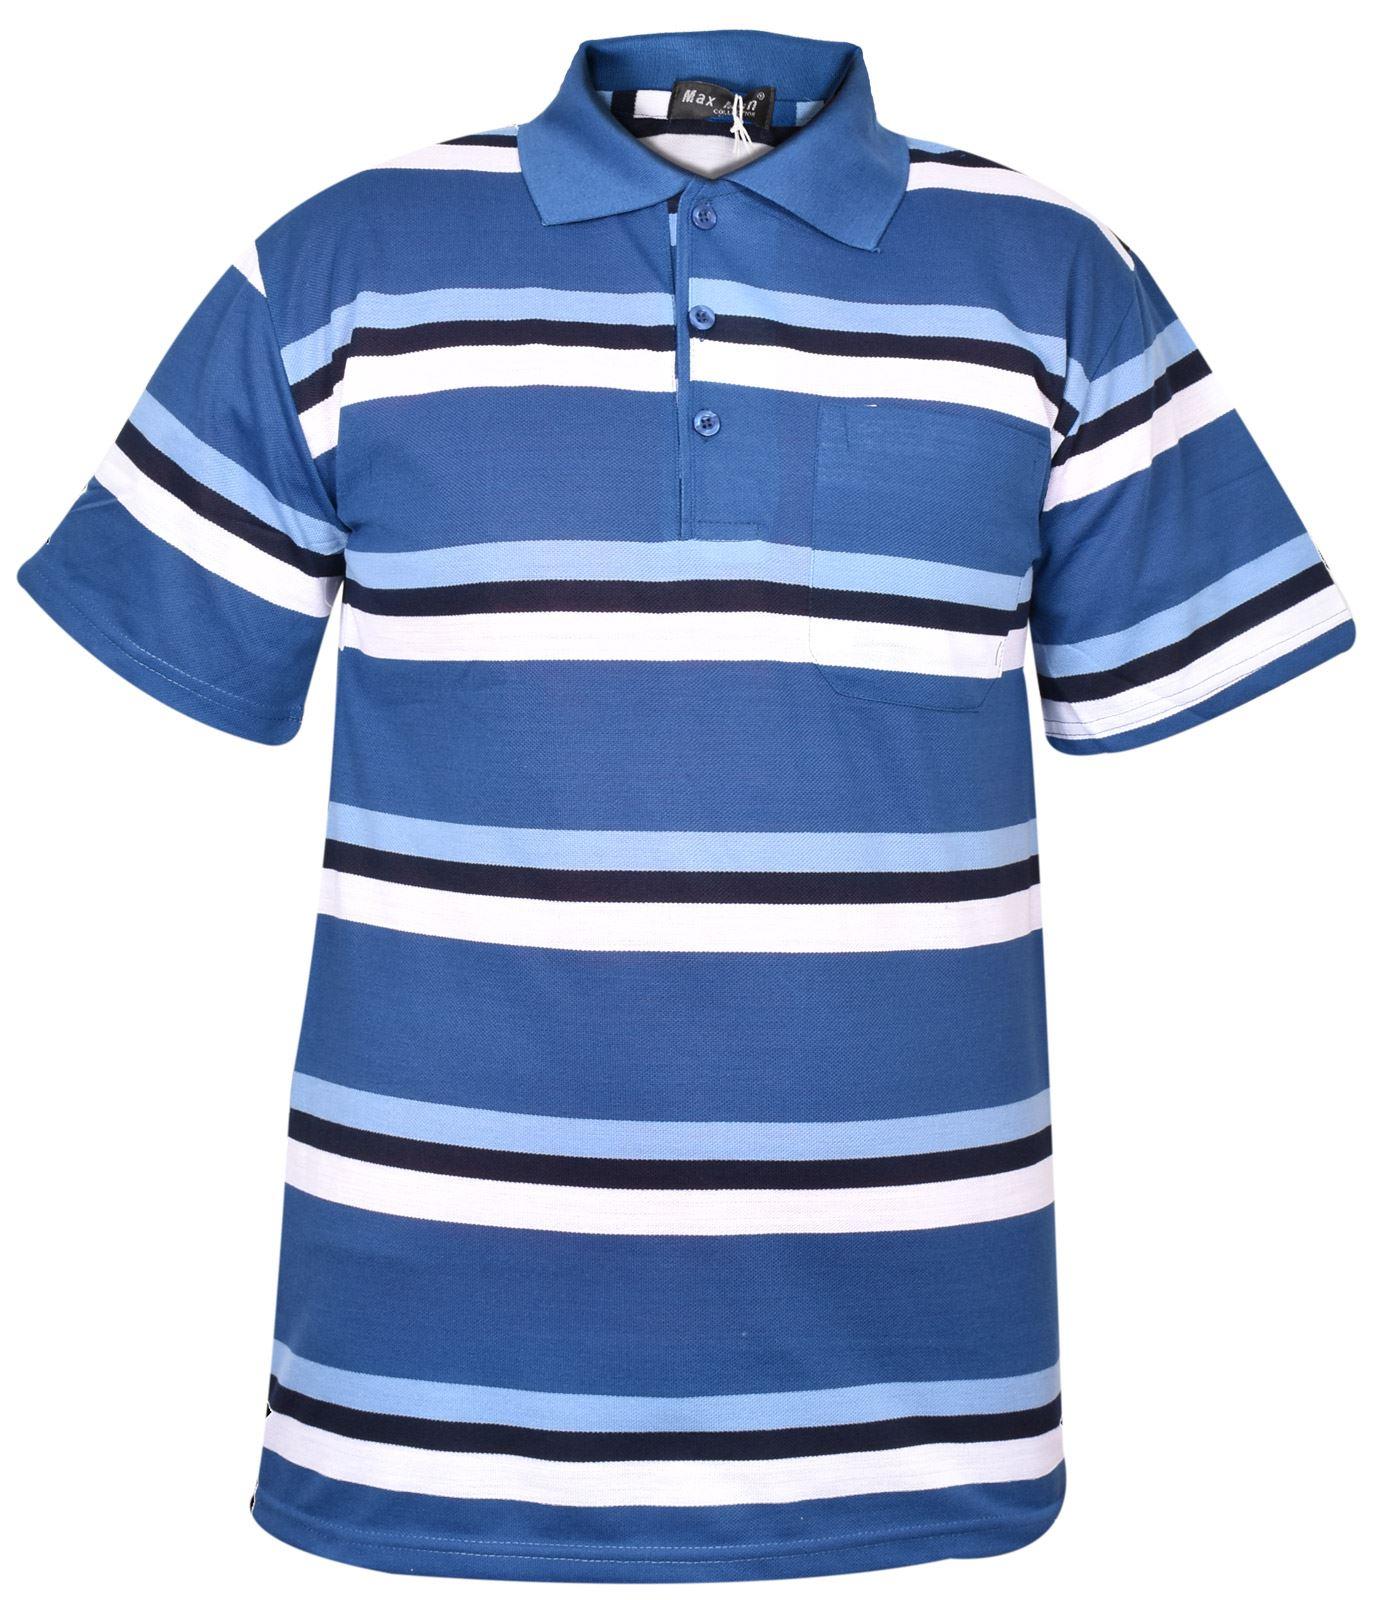 Mens-T-Shirts-Yarn-Dyed-Strip-Pocket-Polo-Shirt-Top-Multi-Colour-Size-M-3XL thumbnail 42